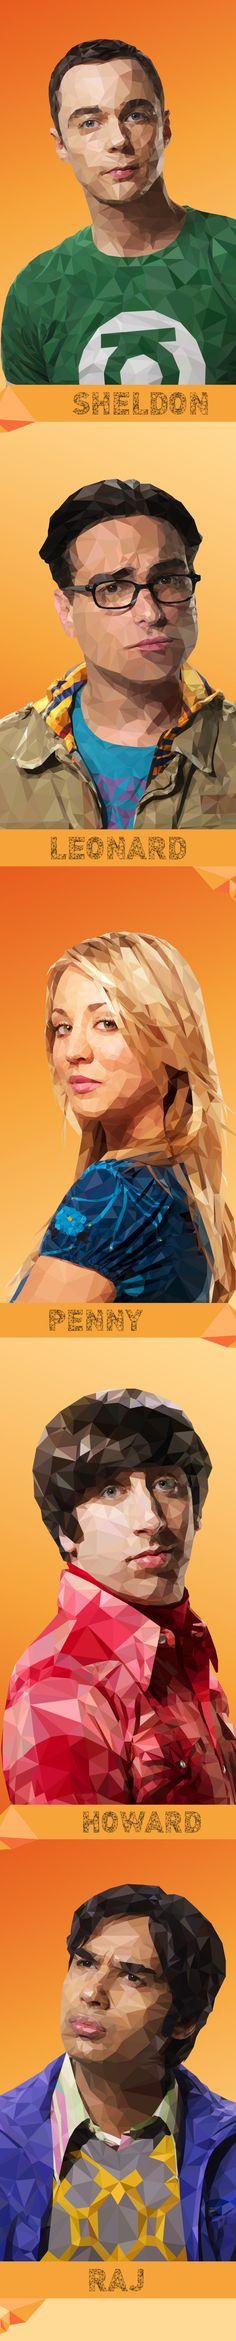 pinterest.com/fra411 #illustration - Big Bang Theory - Low Poly Illustrations by Mordi Levi, via Behance